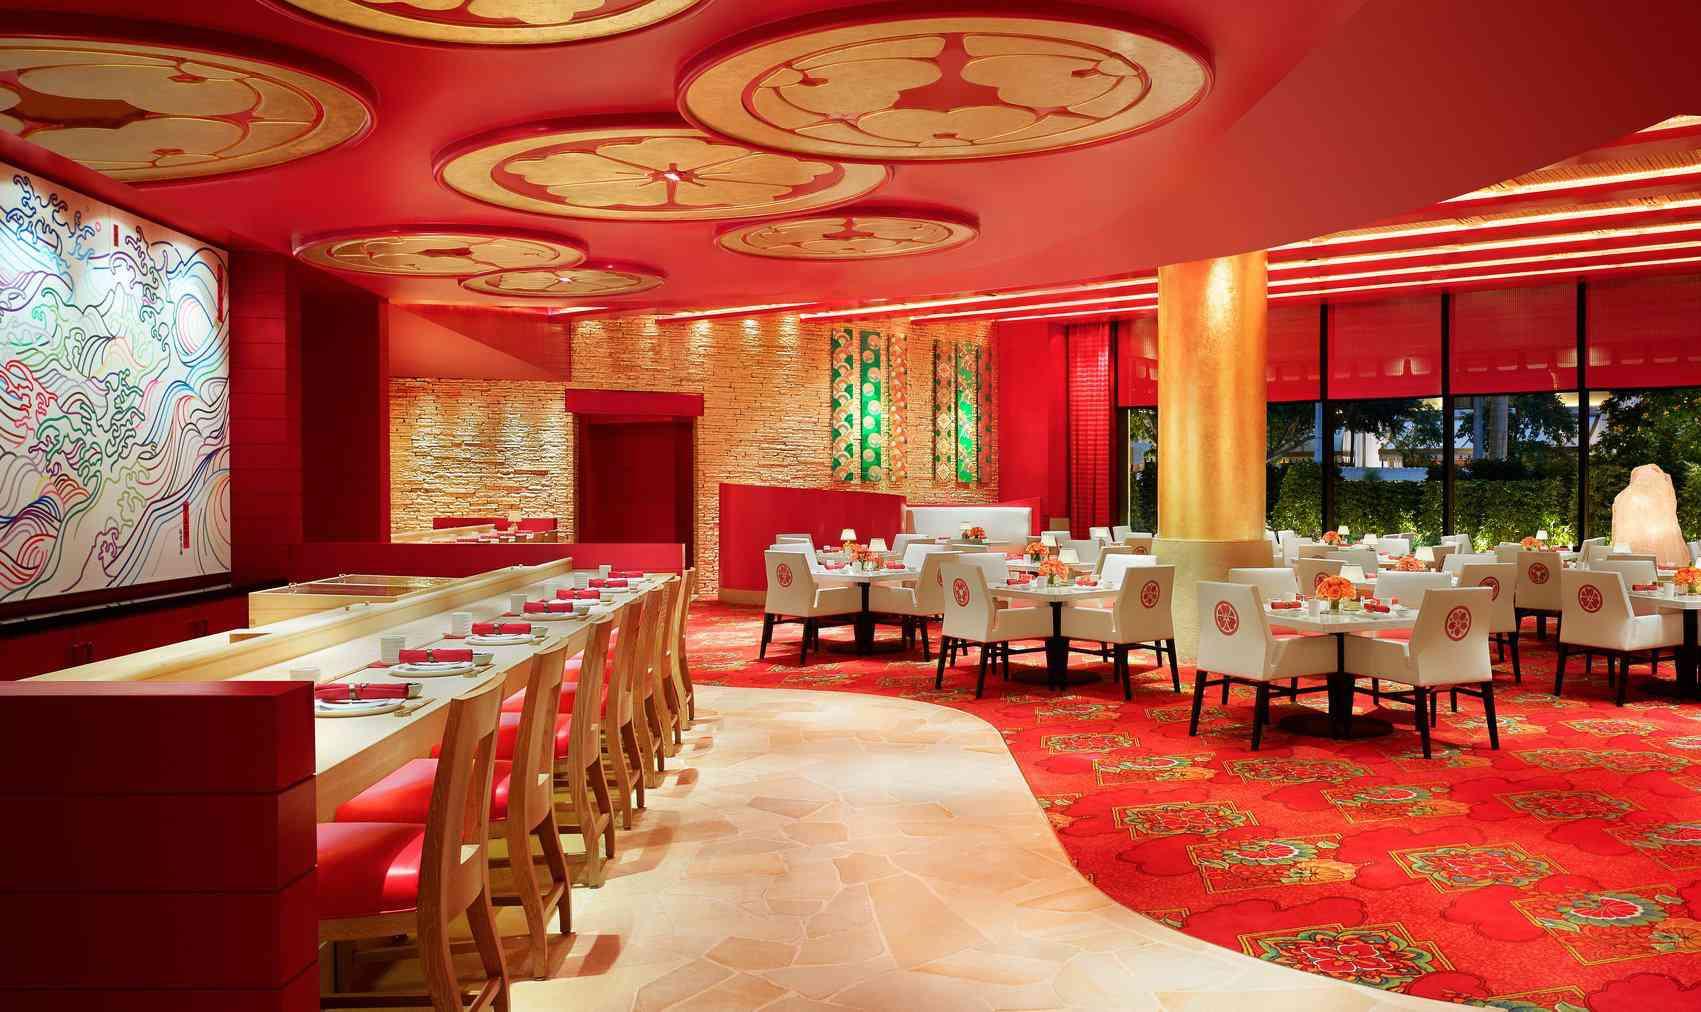 red and gold interior of Mizumi restaurant